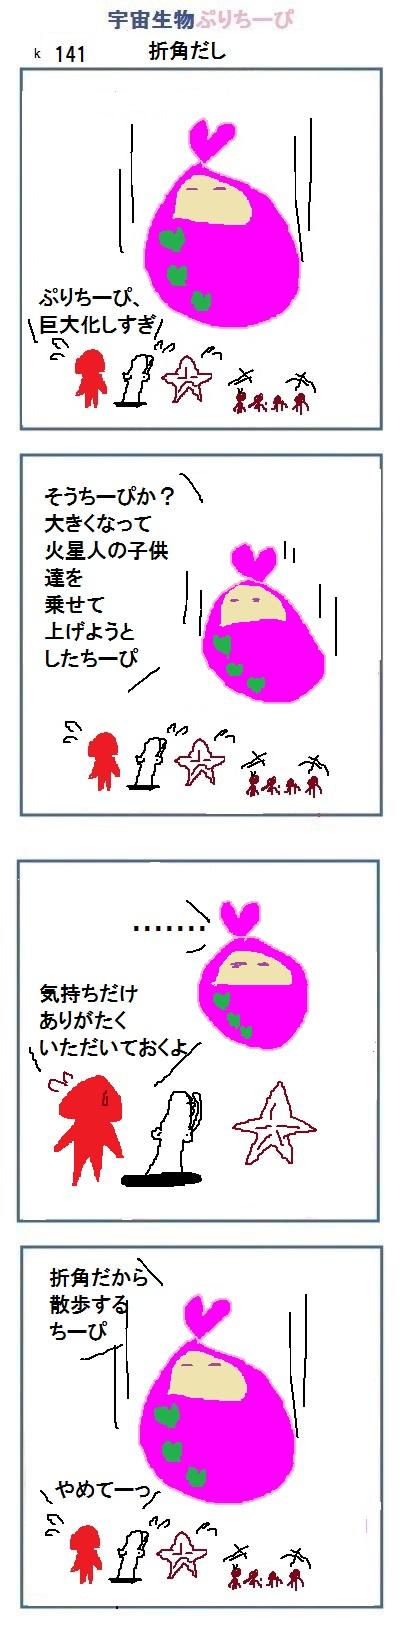 161024_k141